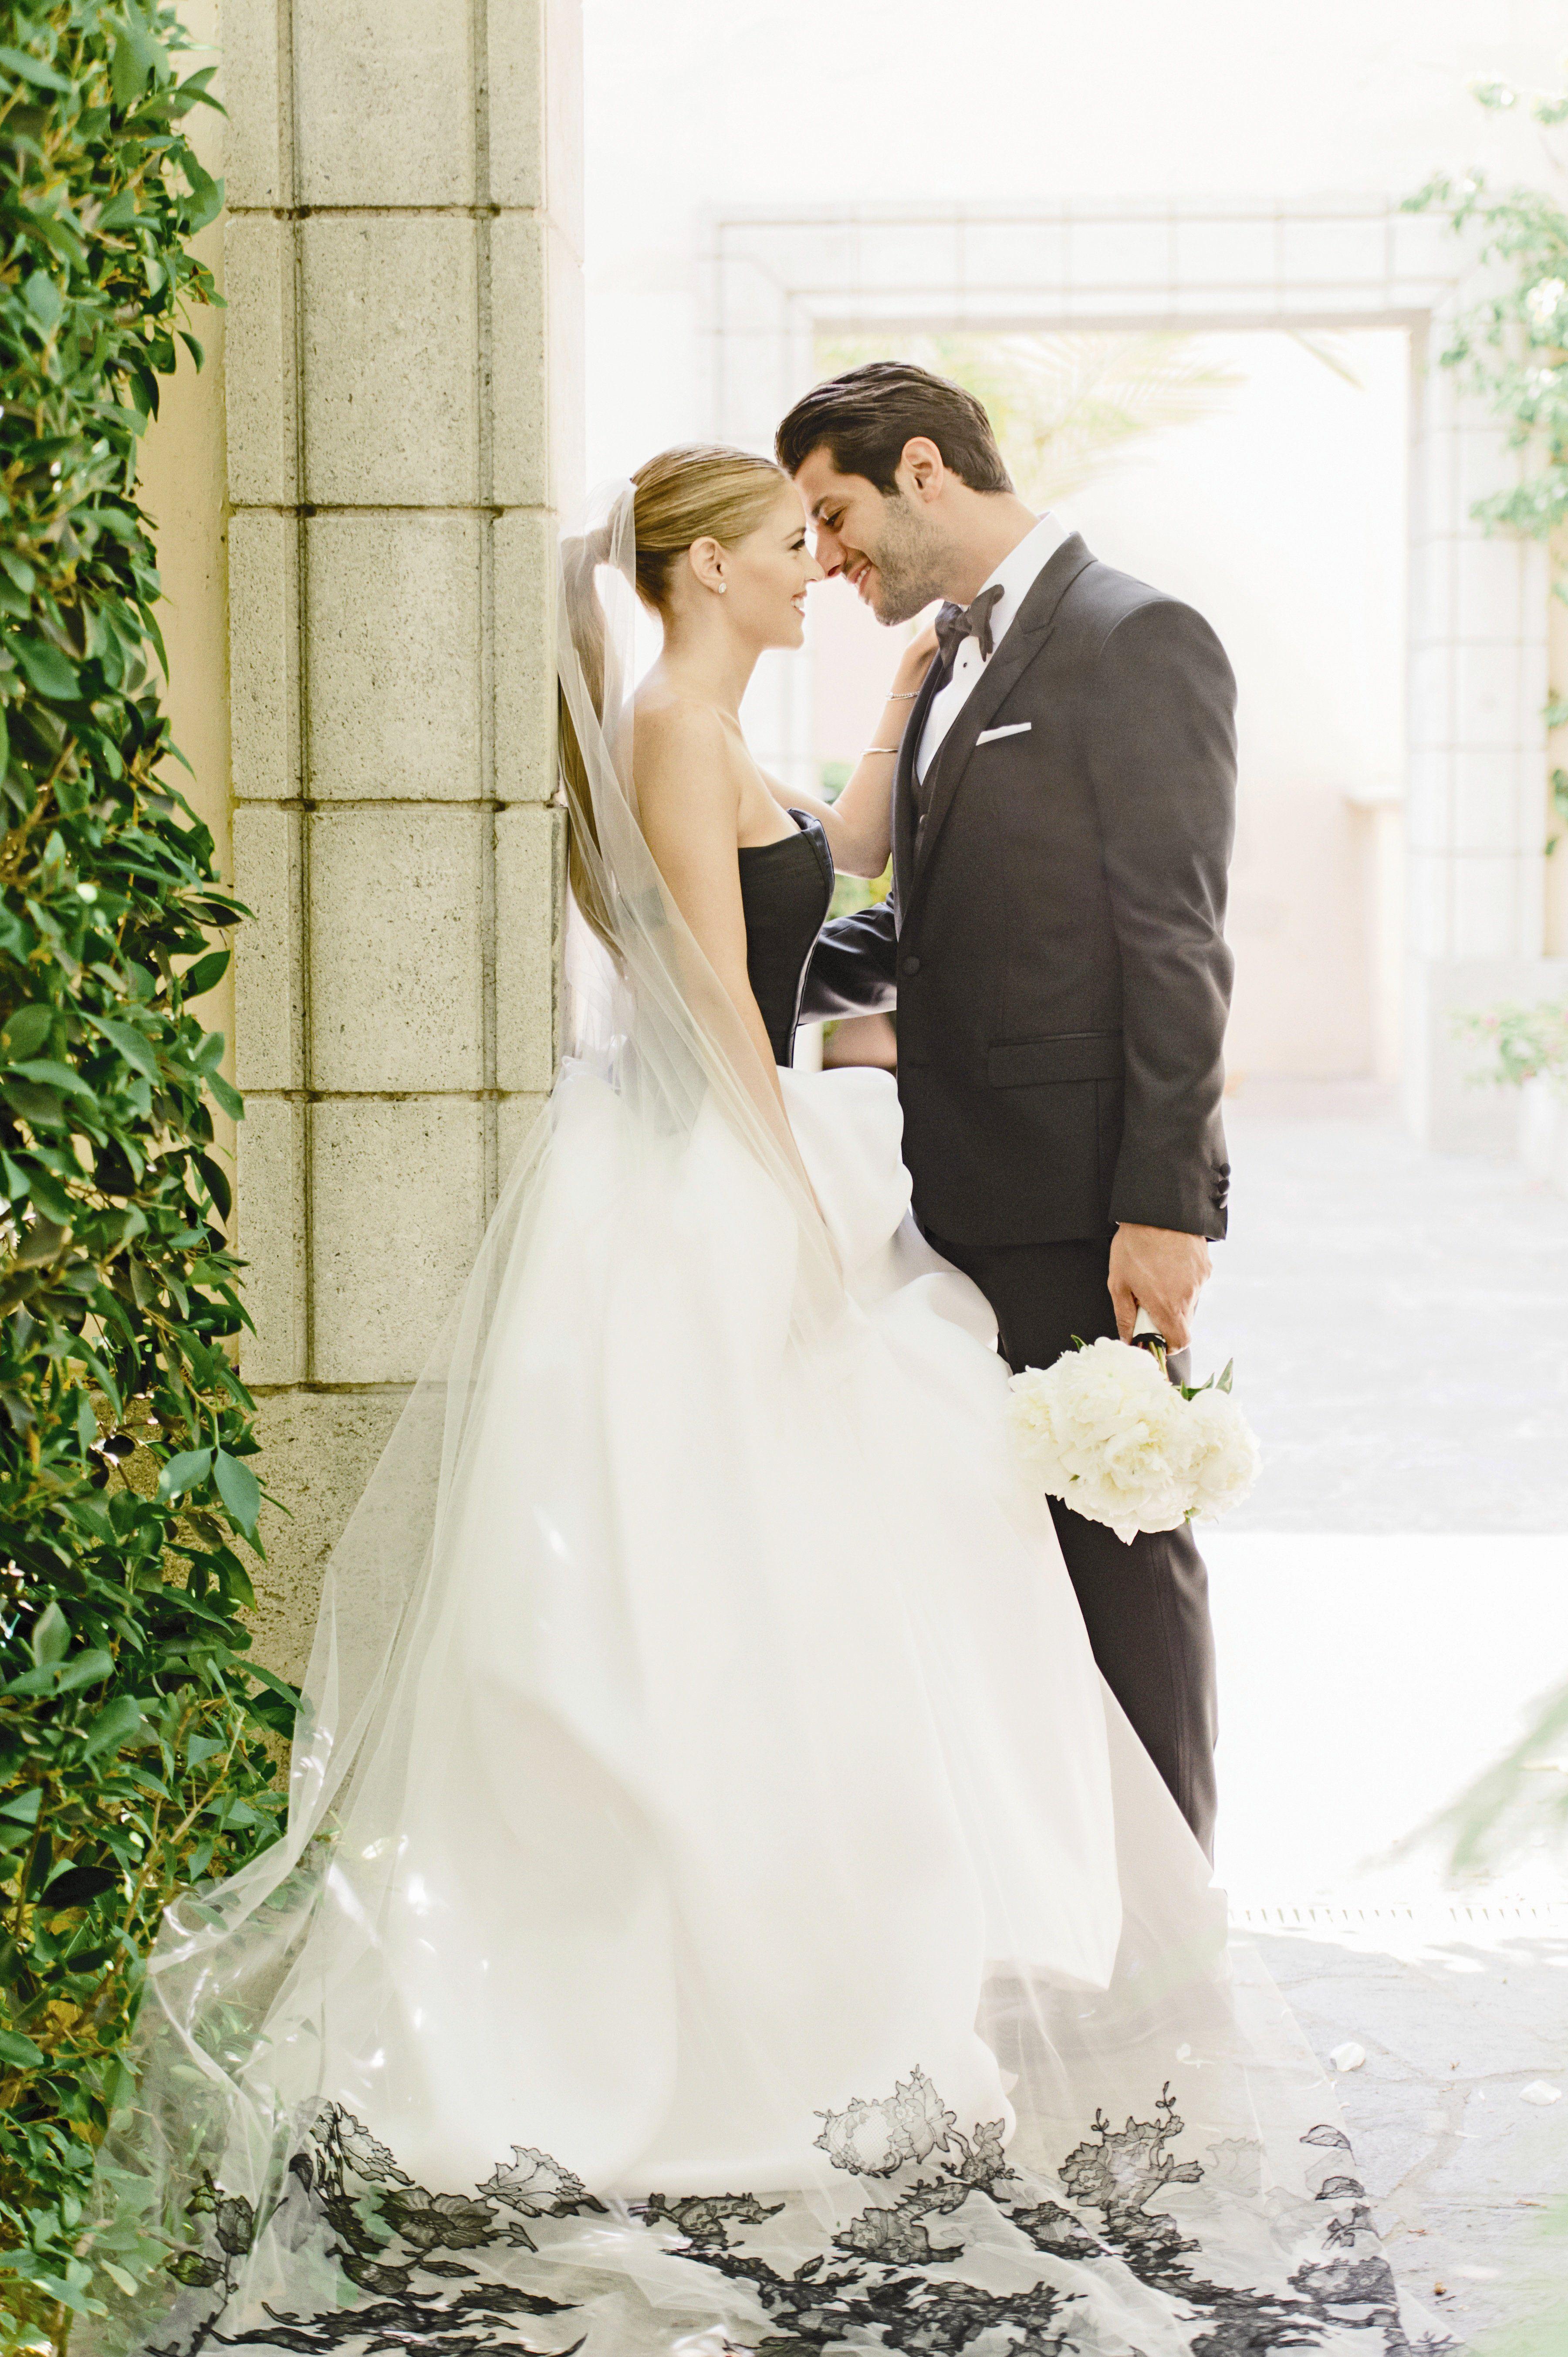 Wedding dresses cheap los angeles  A Black u White Chic Wedding at Hotel Bel Air in Los Angeles